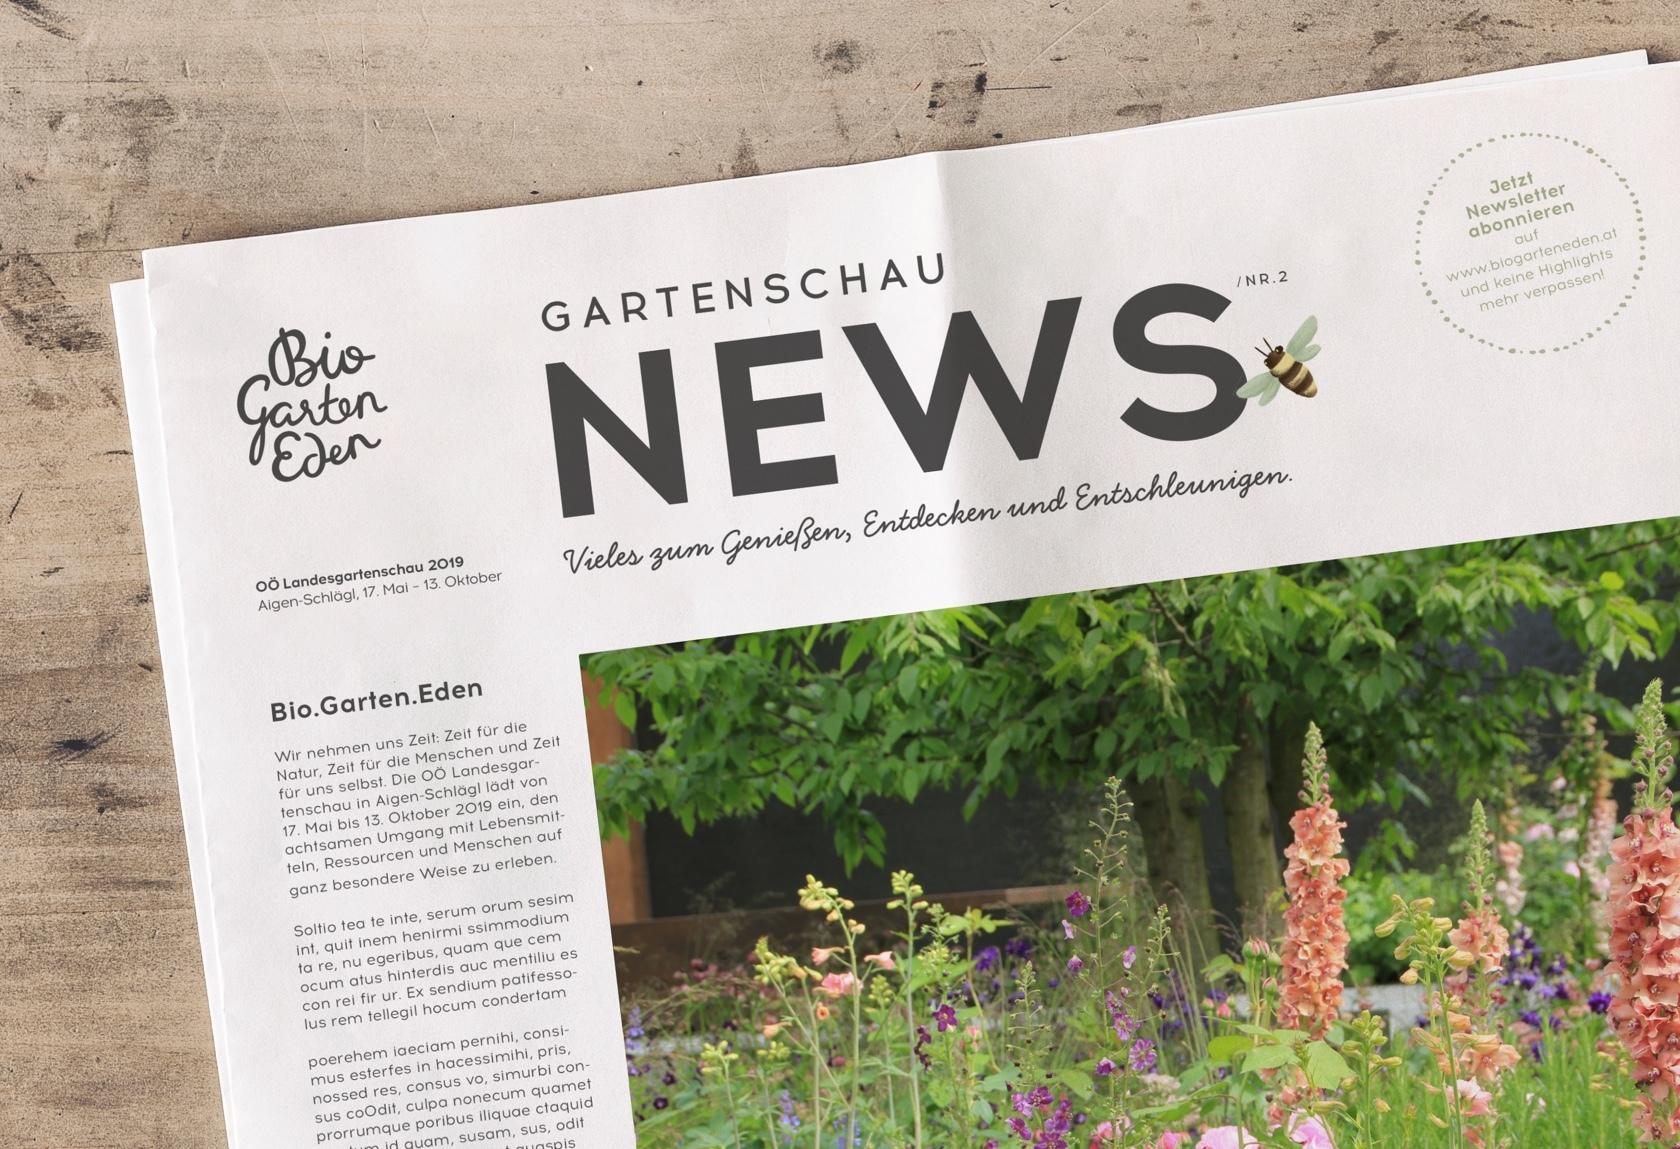 OÖ Landesgartenschau News